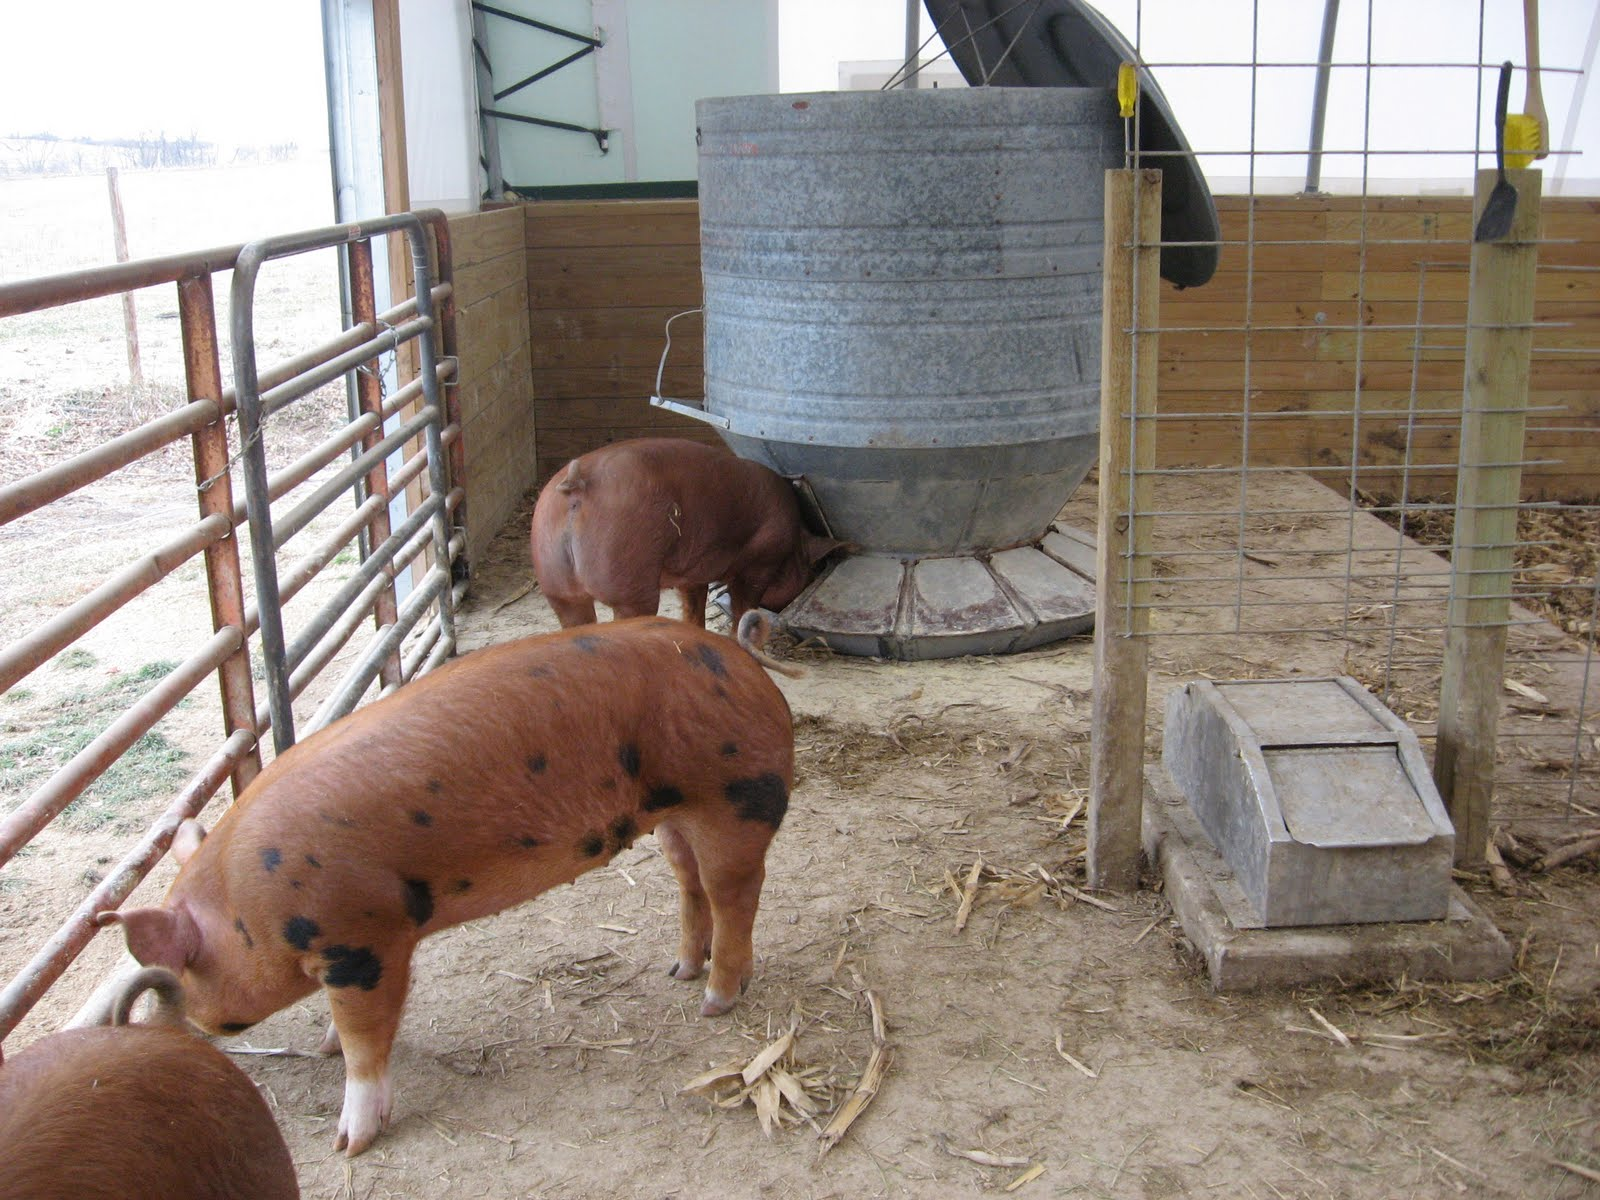 Prairie Fire Farm: January 2012